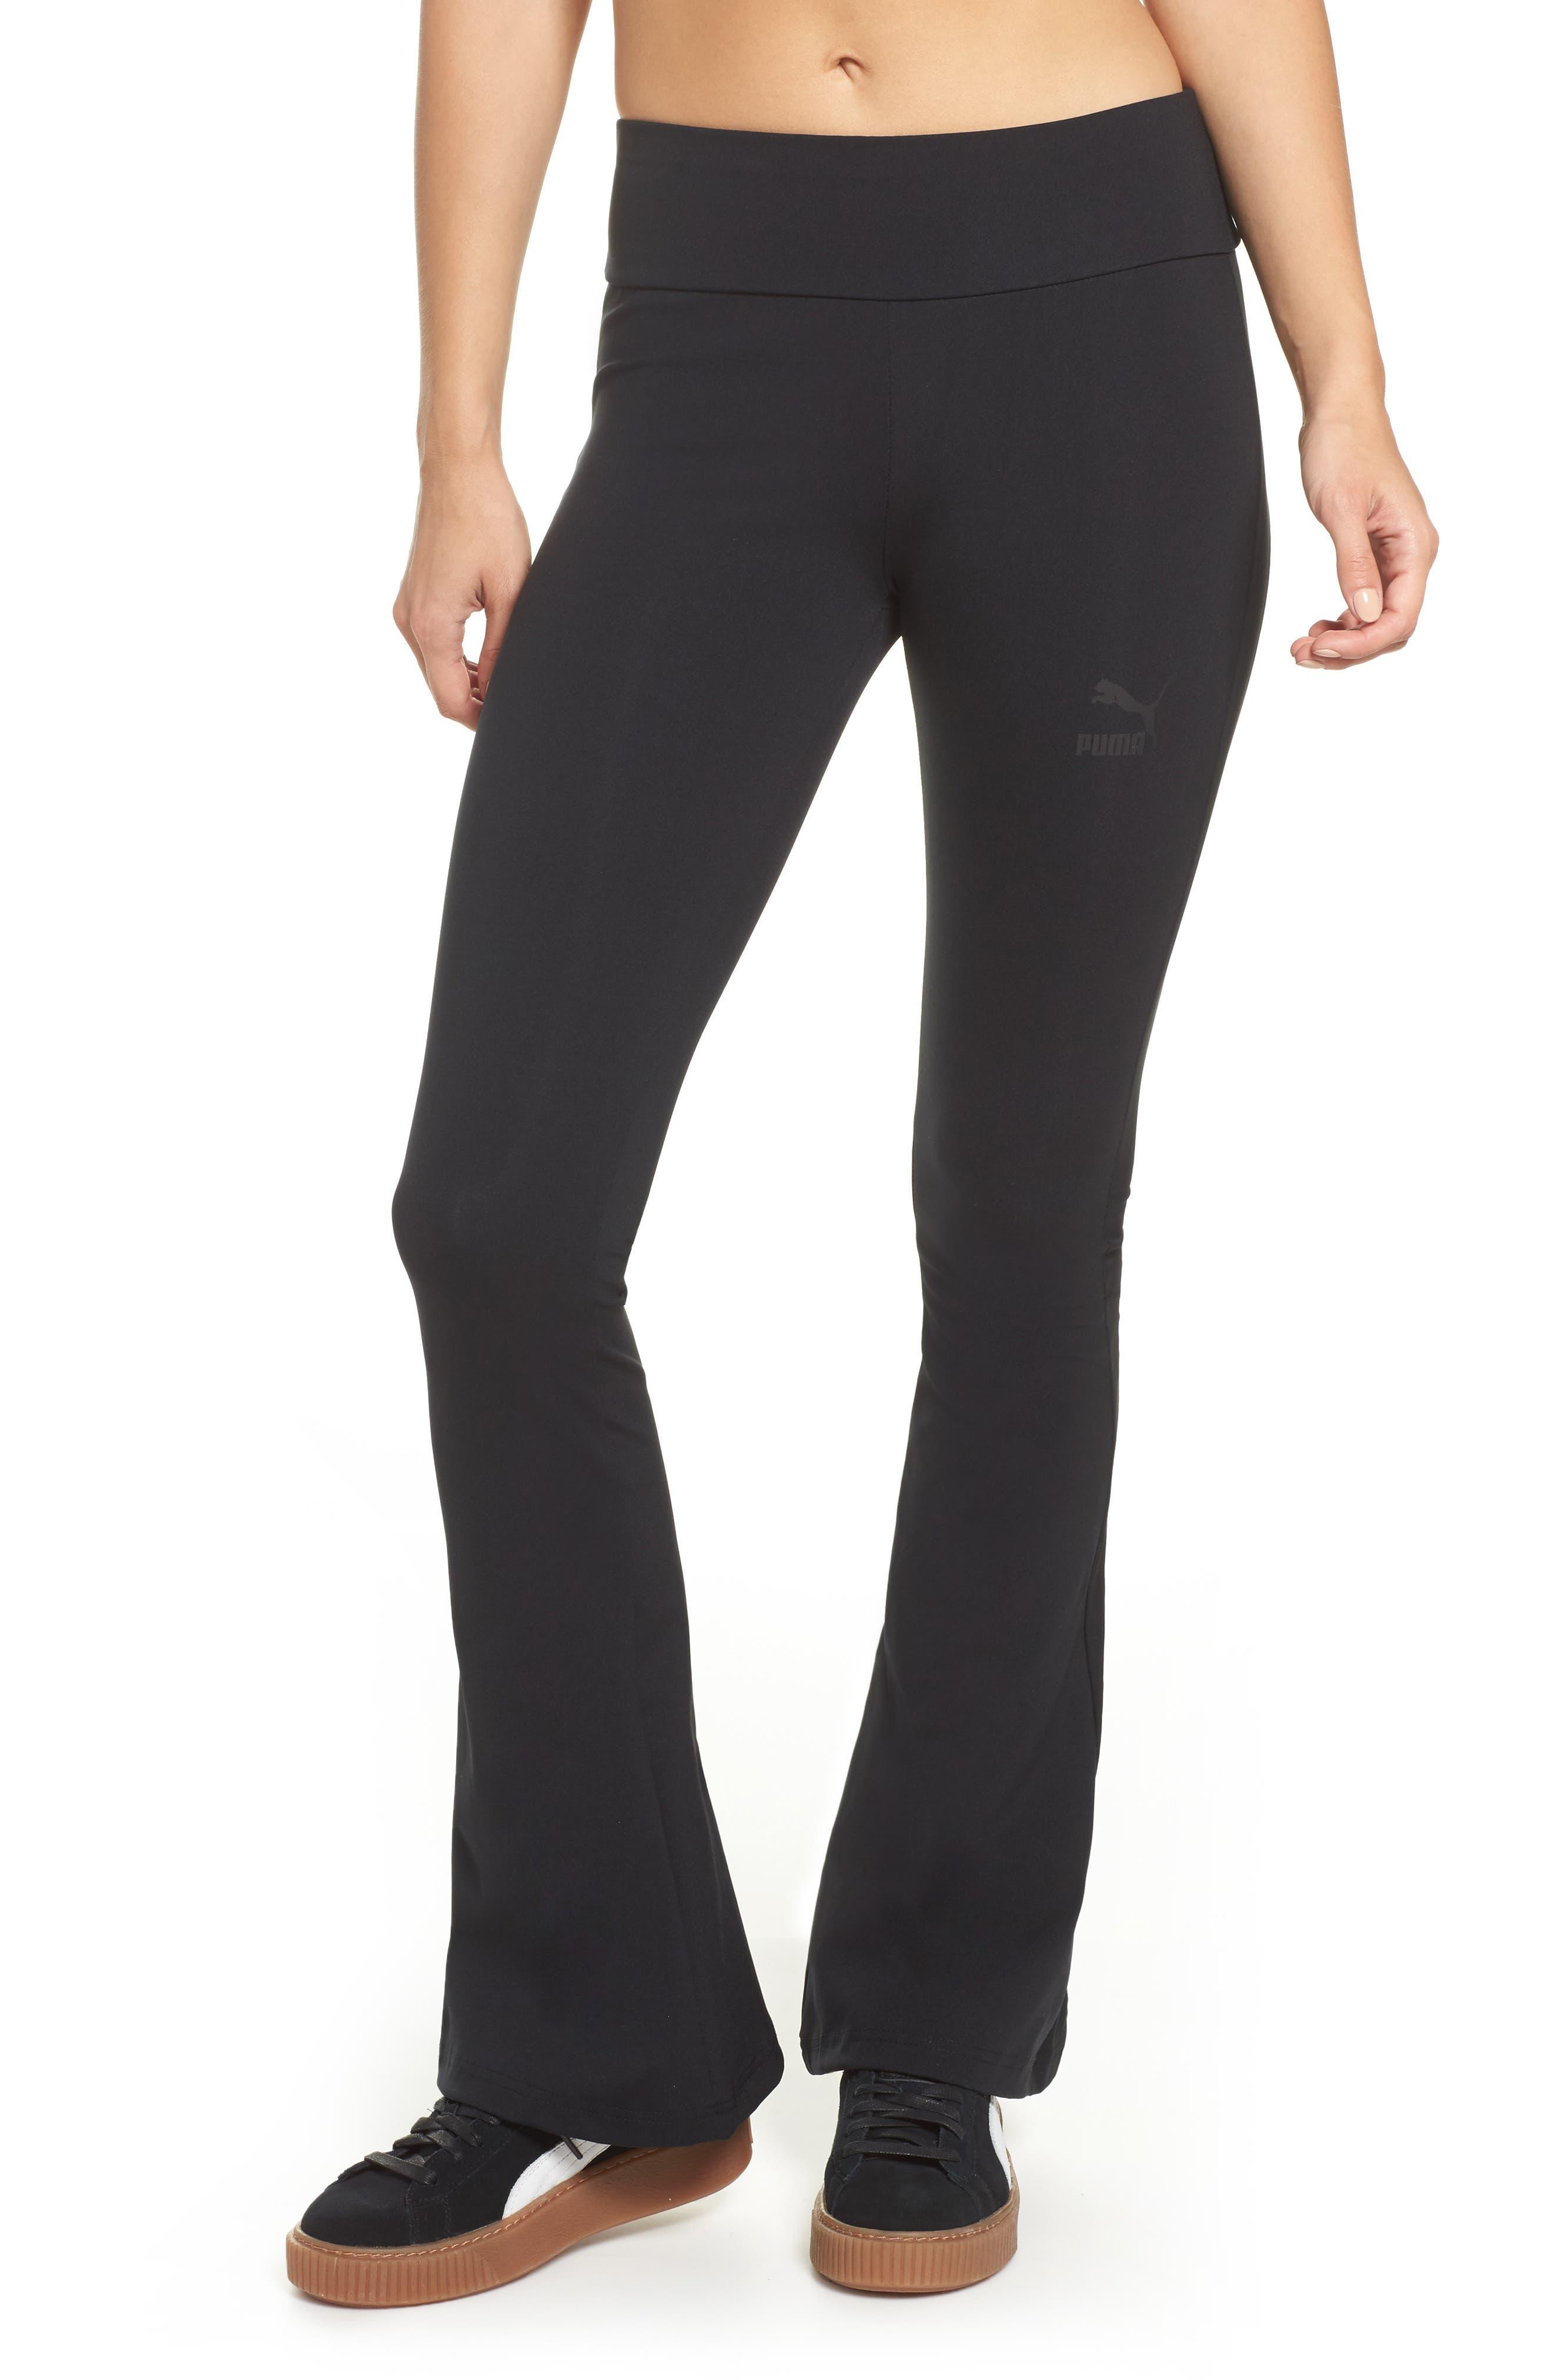 Flare Leggings,                         Main,                         color, Cotton Black